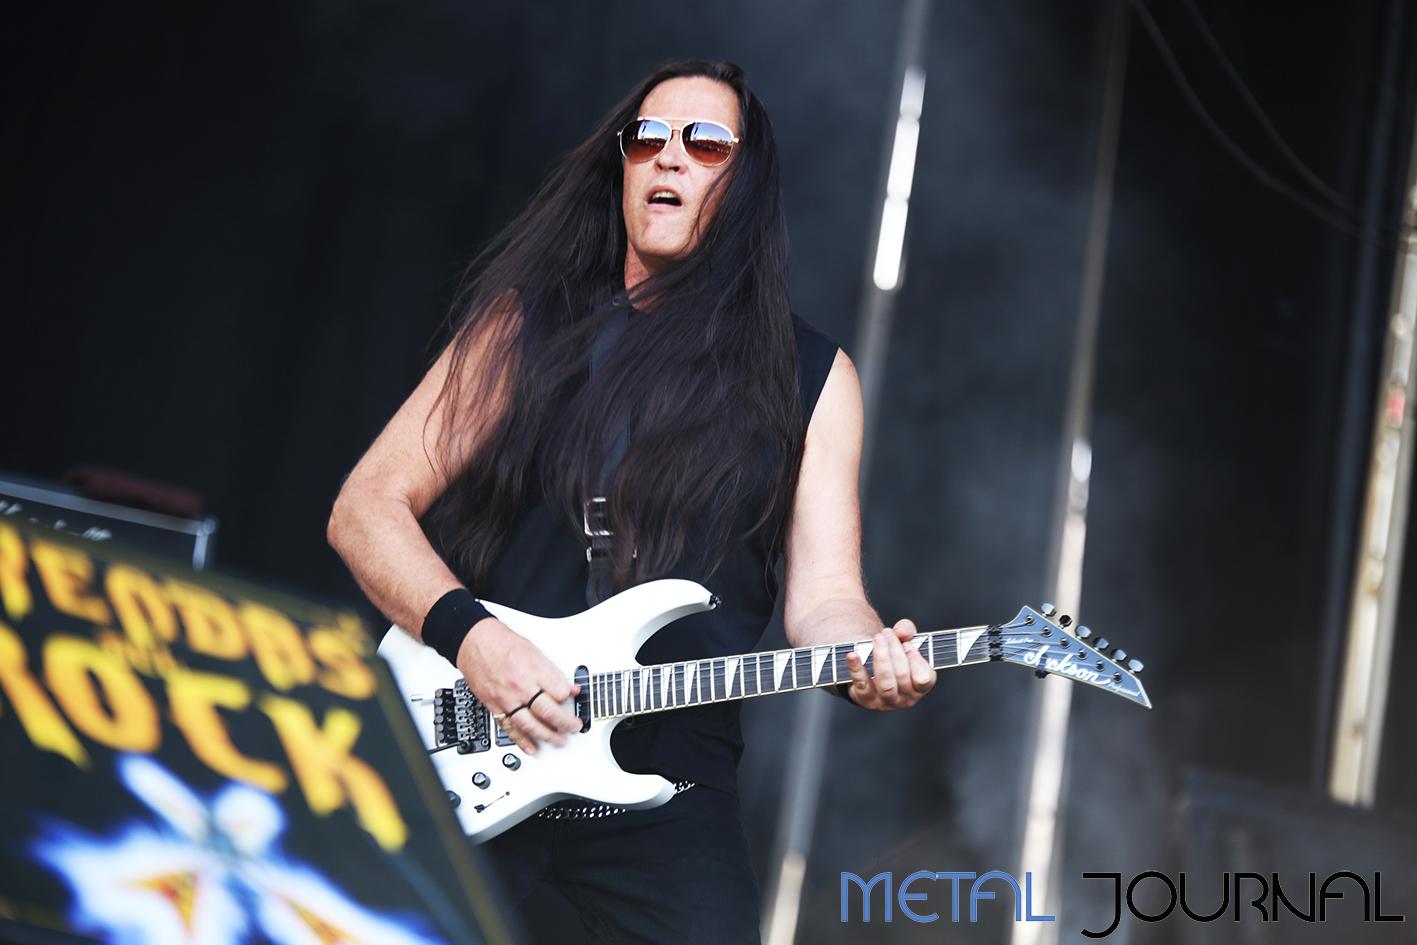 metal church - leyendas del rock 2019 metal journal pic 6